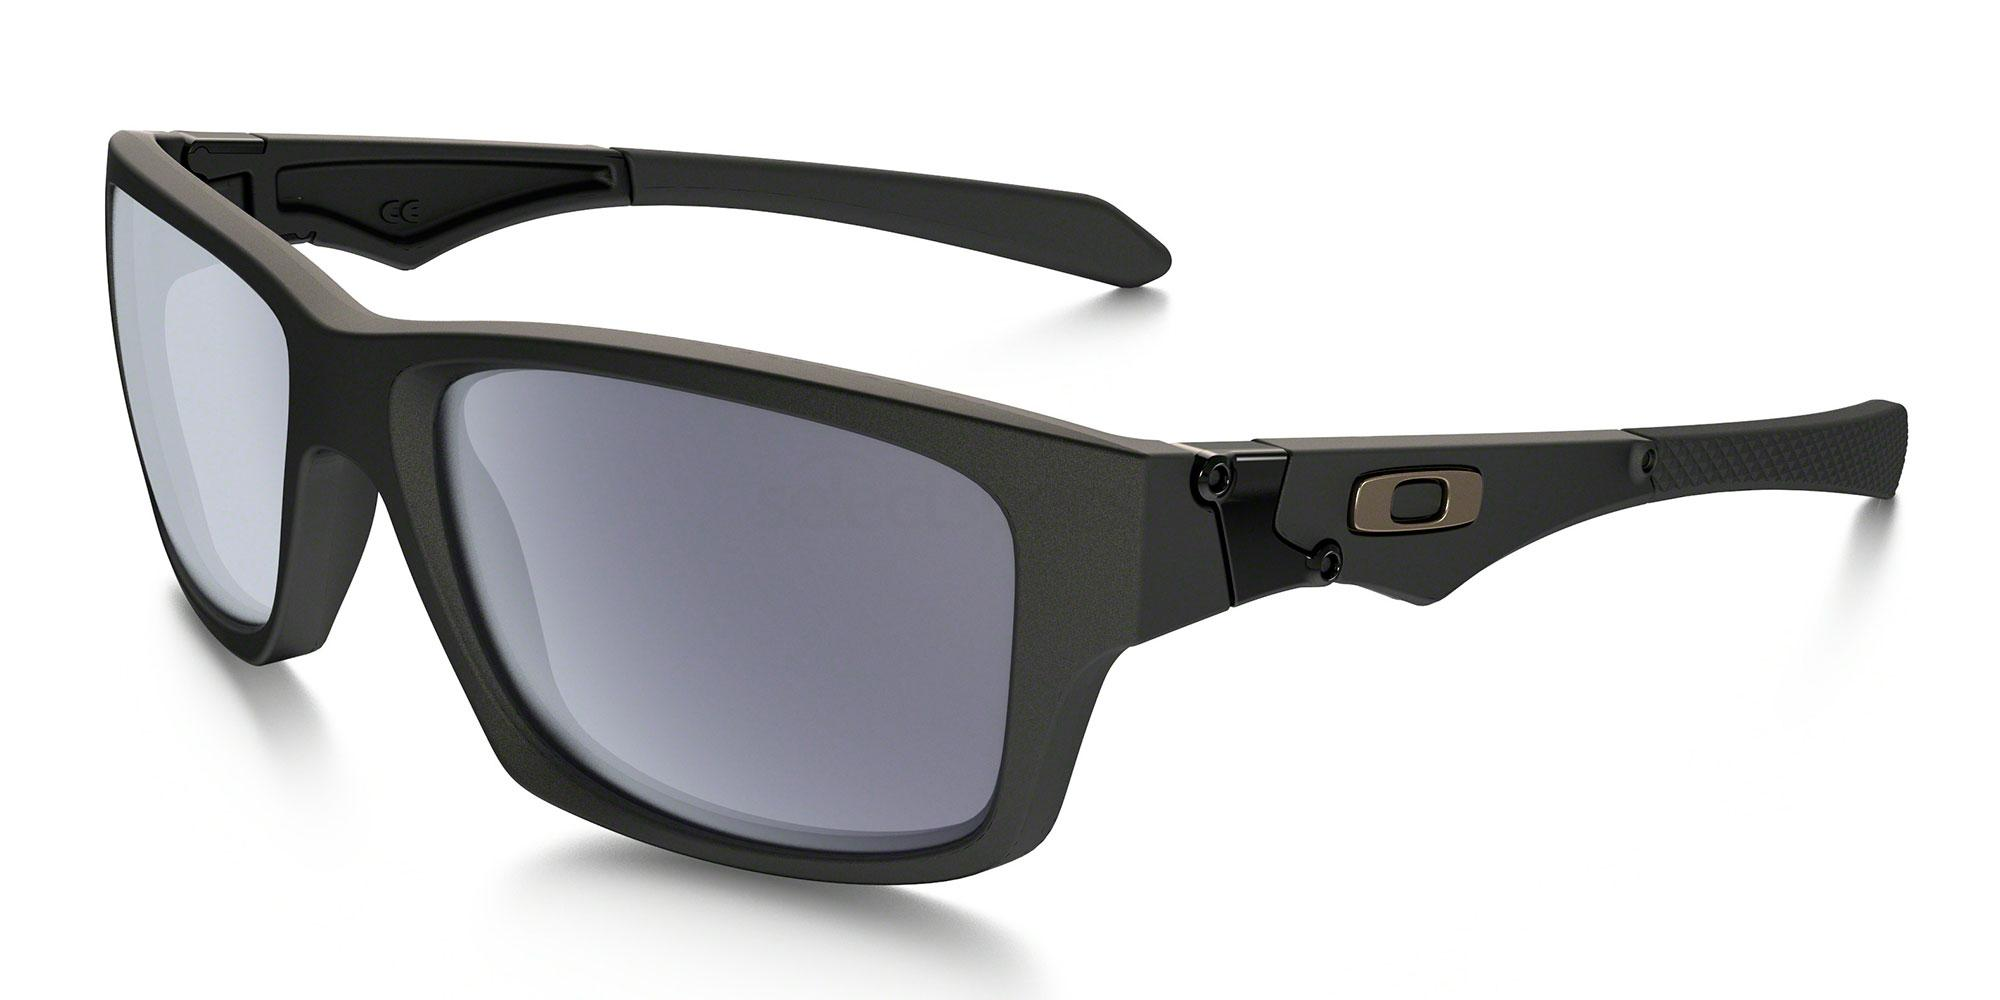 913525 OO9135 JUPITER SQUARED (Standard) Sunglasses, Oakley